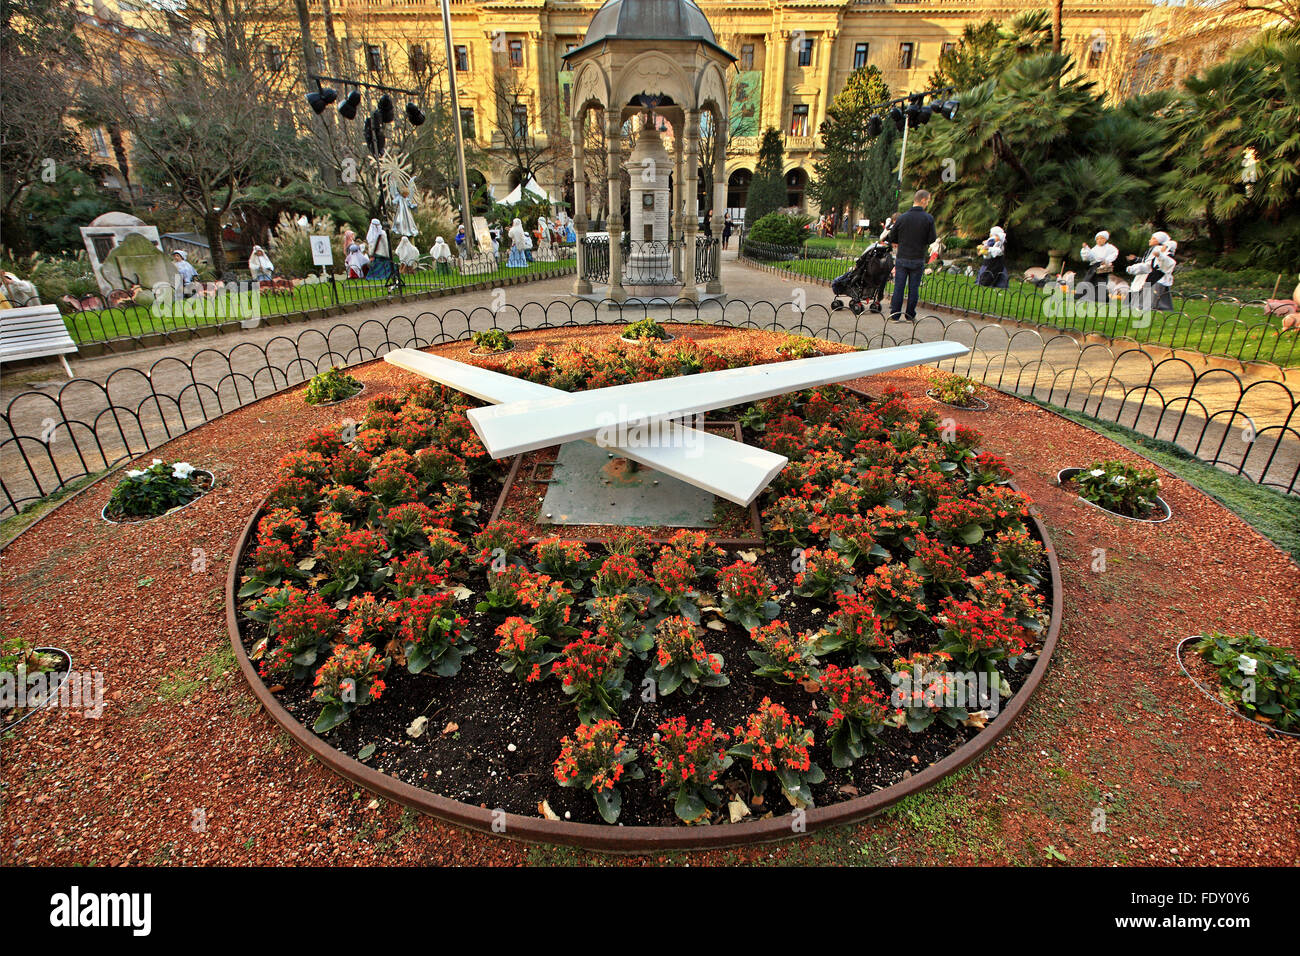 The flower clock in Plaza de Guipozkoa, San Sebastian (Donostia), Basque Country, Spain. - Stock Image